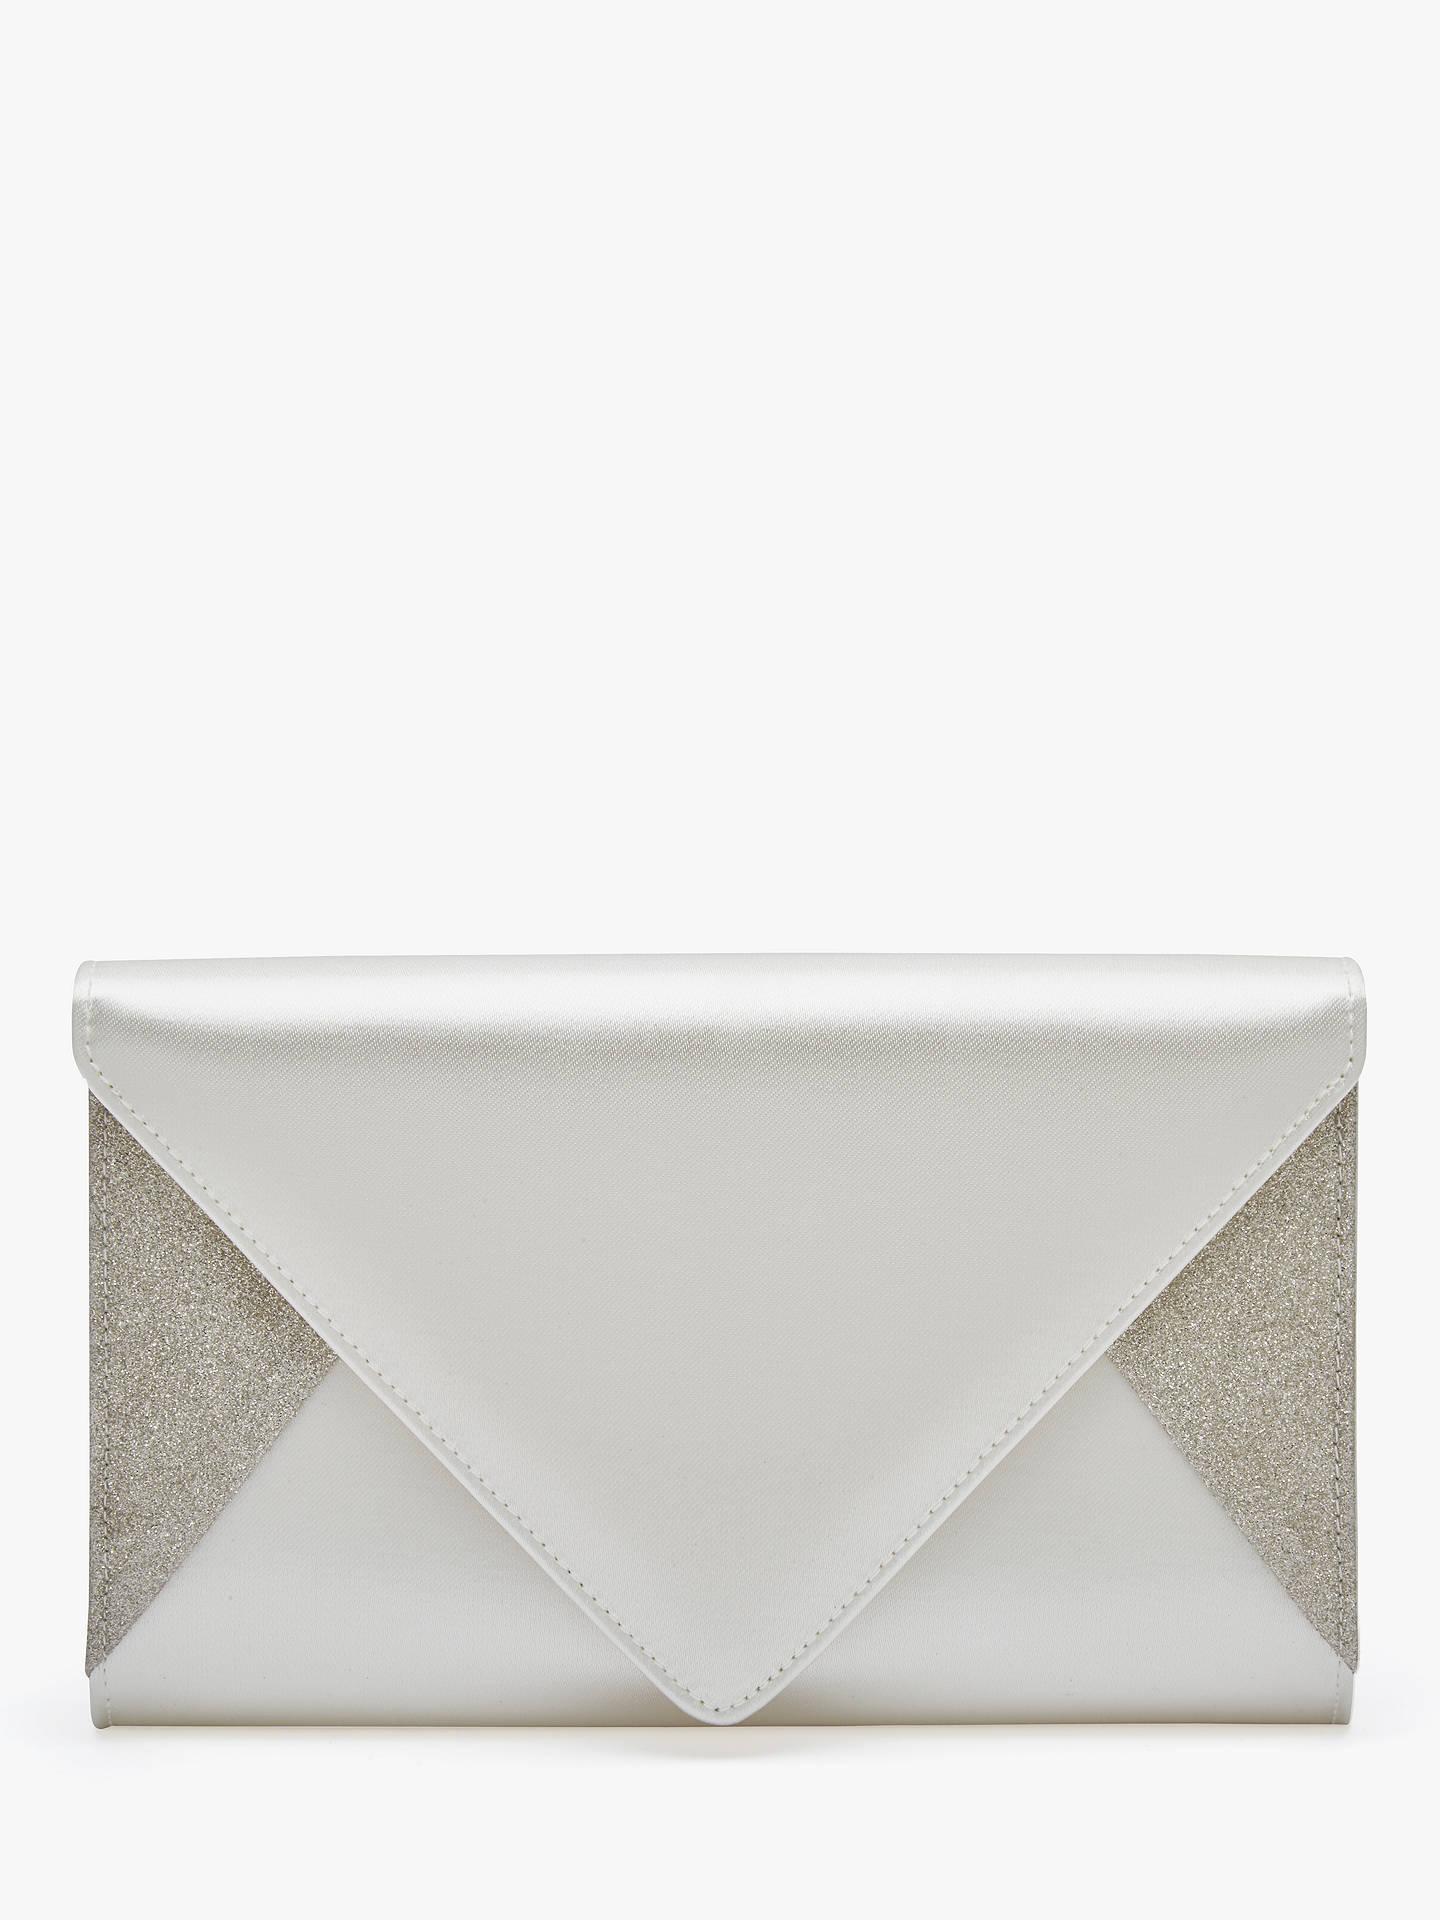 82910c1df25 Buy Rainbow Club Diane Clutch Bag, Ivory Online at johnlewis.com